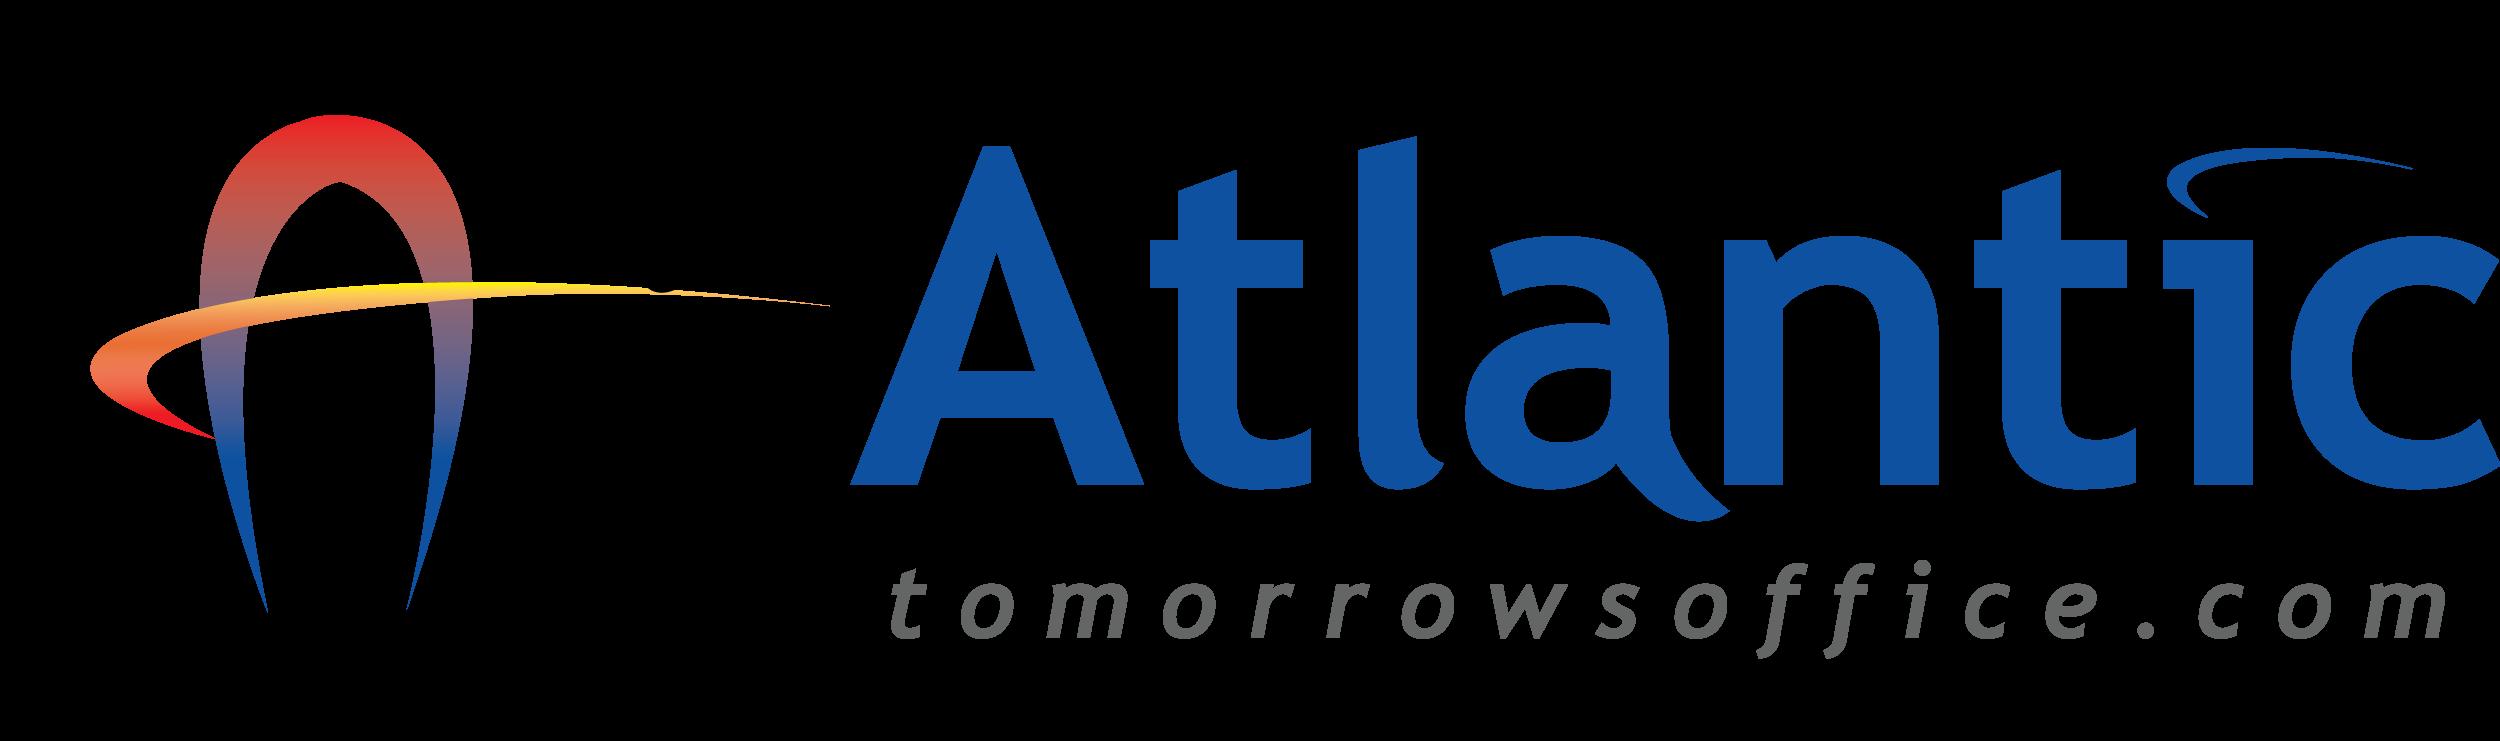 atlantic logo atlantic tomorrow s office